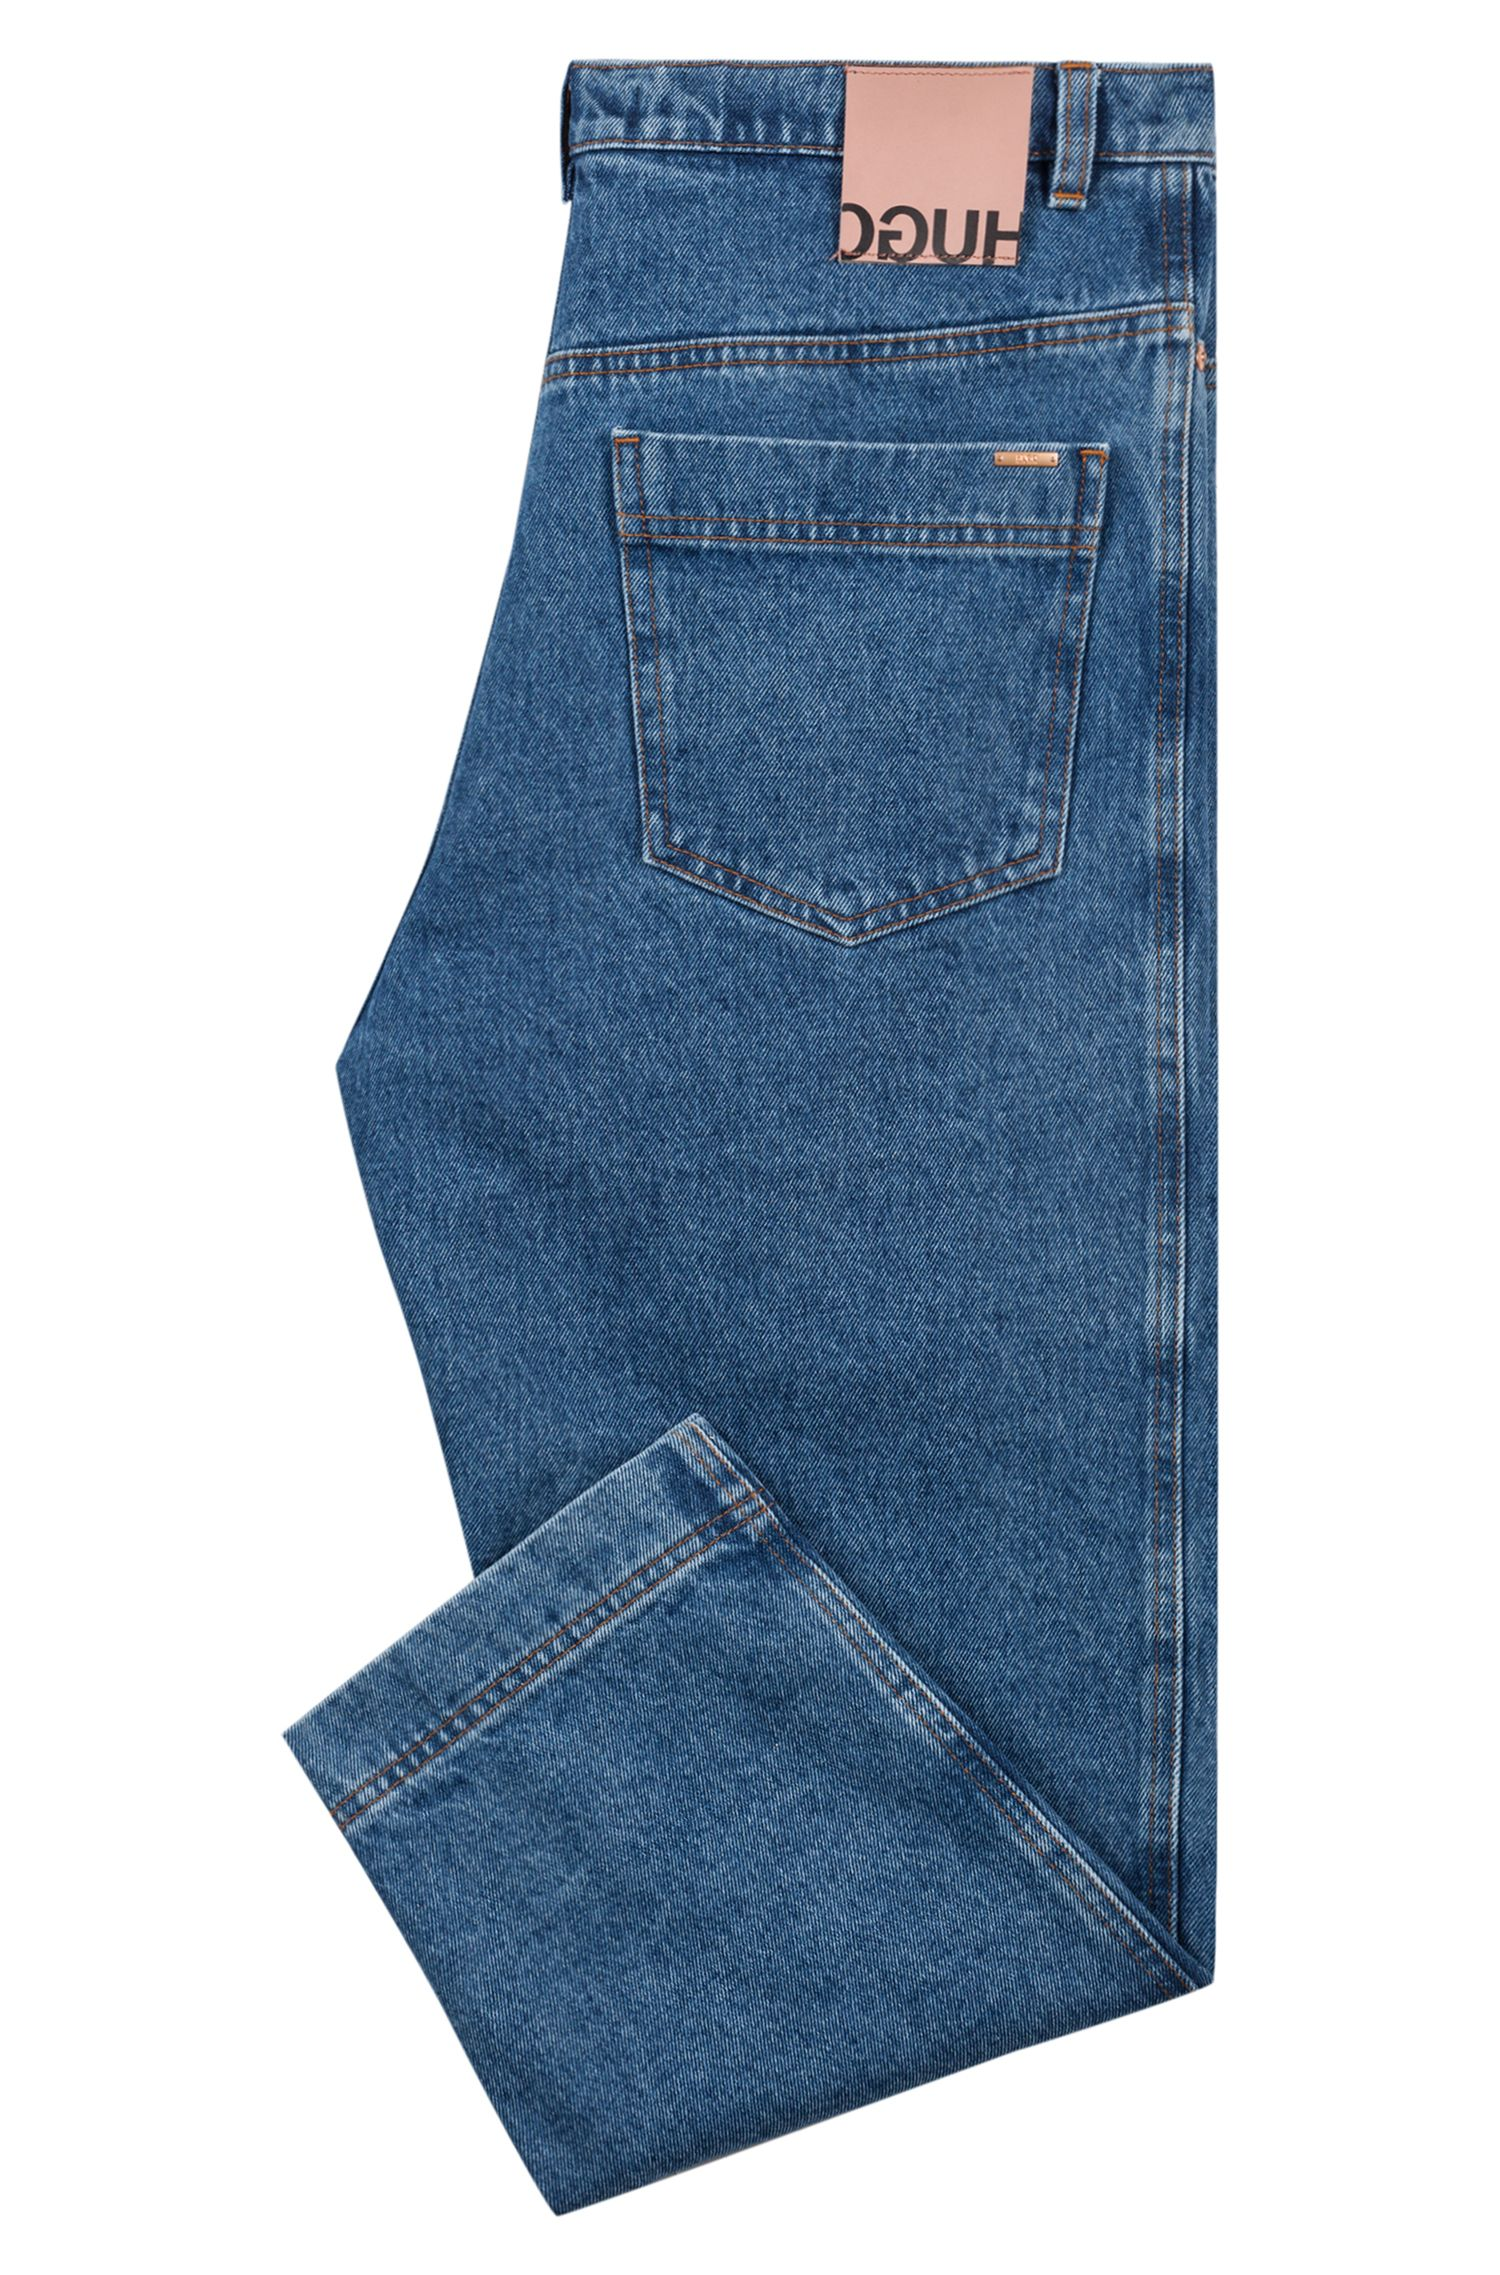 Hugo Boss - Relaxed-Fit Jeans in Cropped-Länge mit Bundfalten - 4